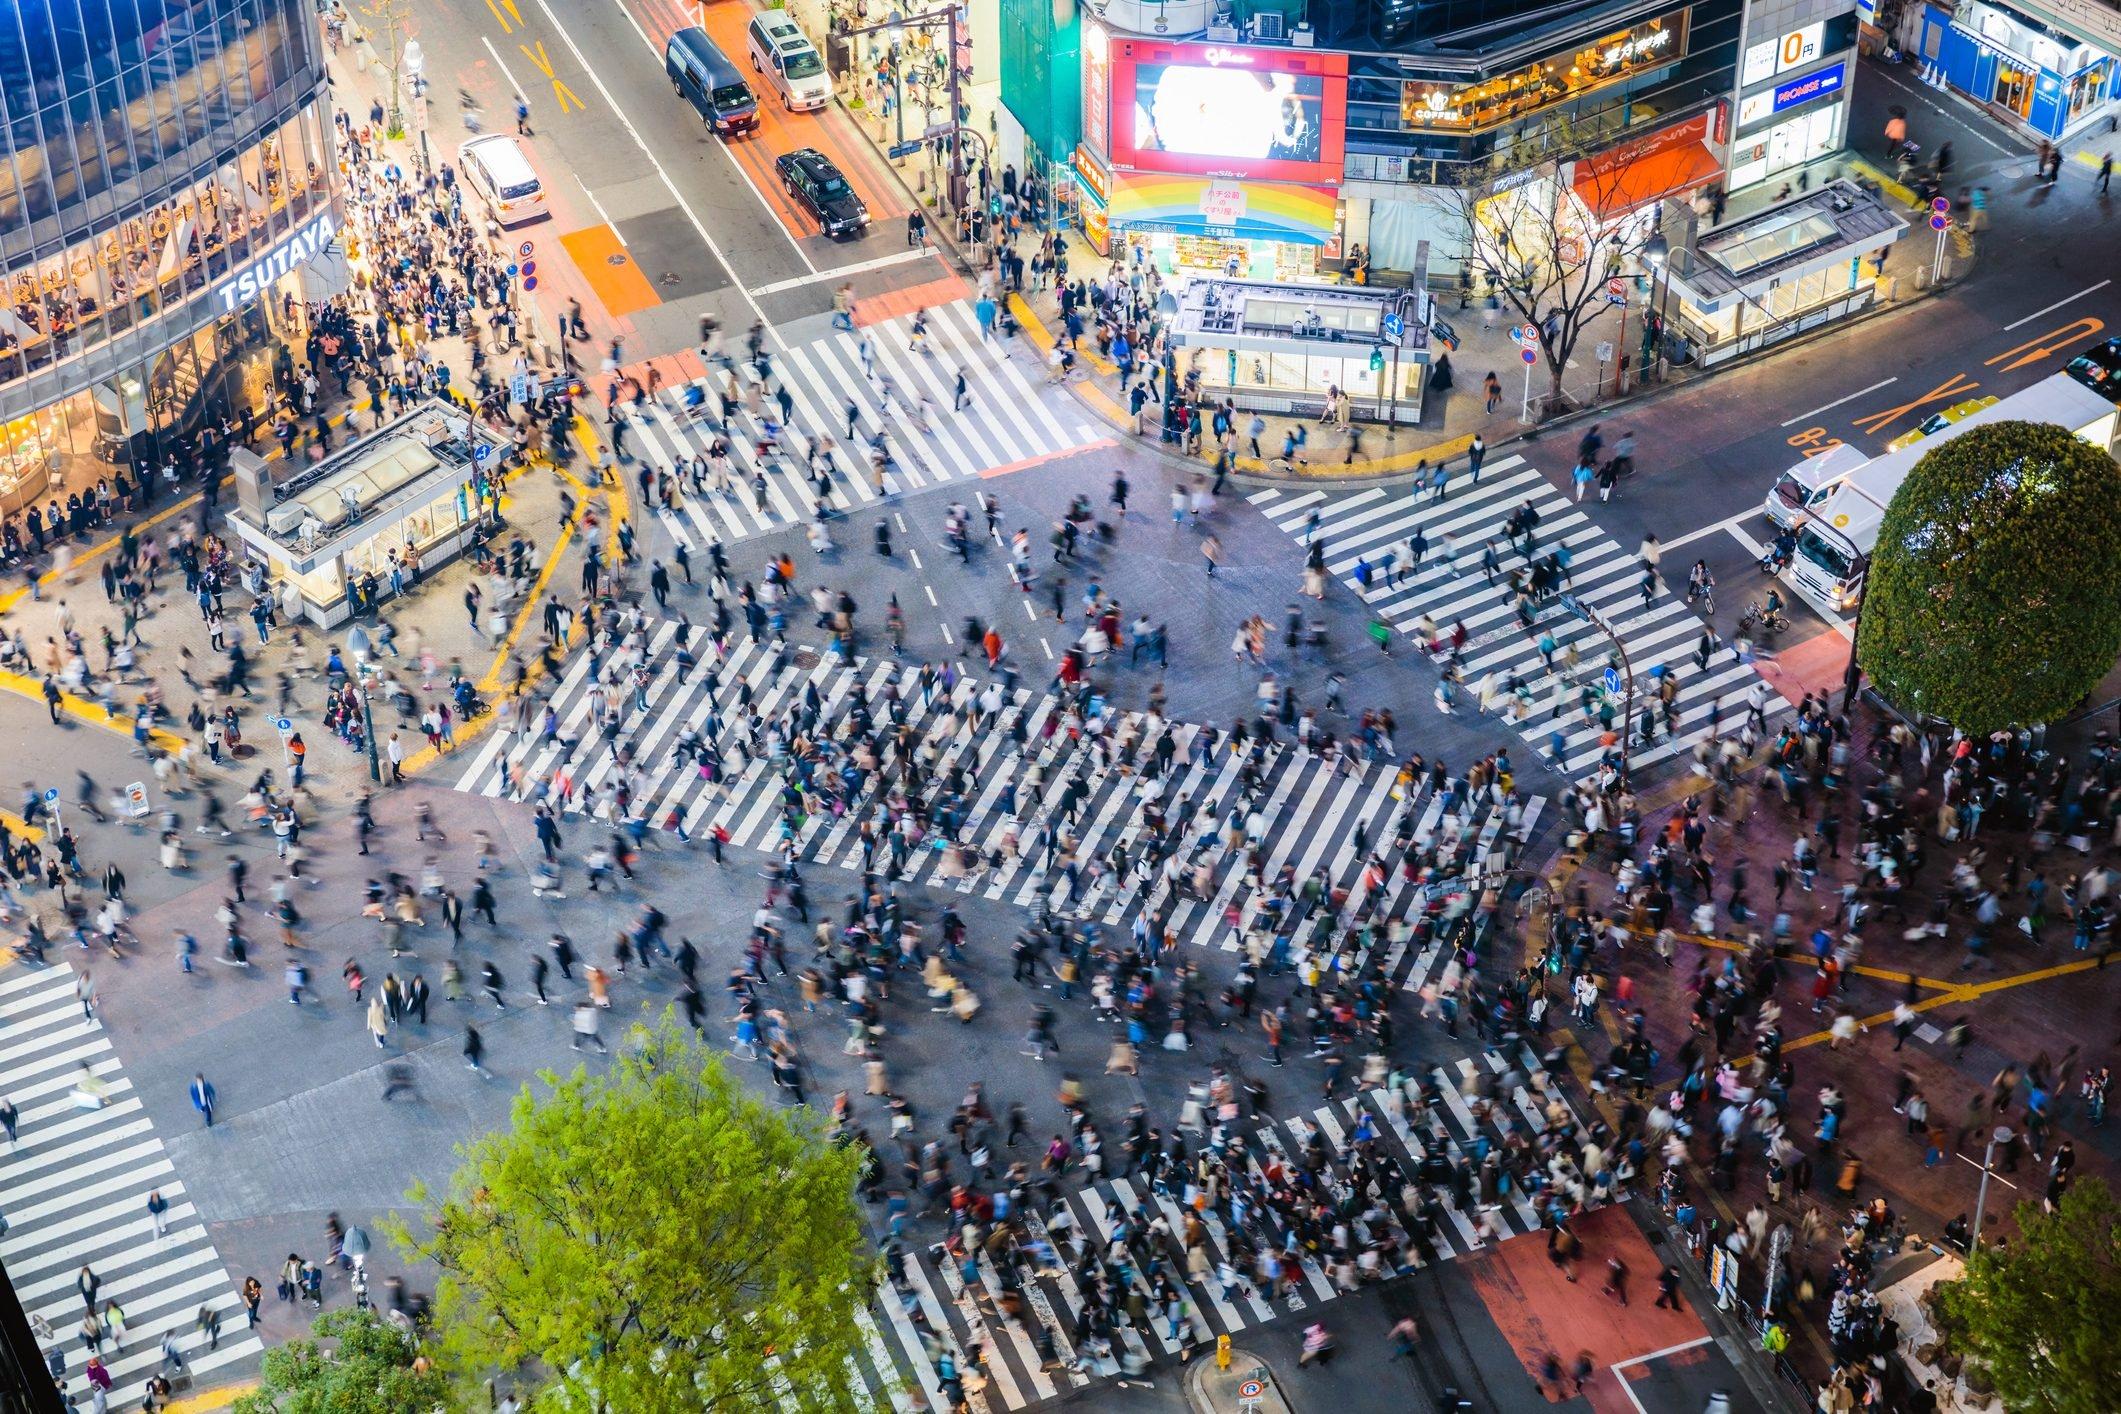 Famous Shibuya pedestrian crossing, Tokyo, Japan